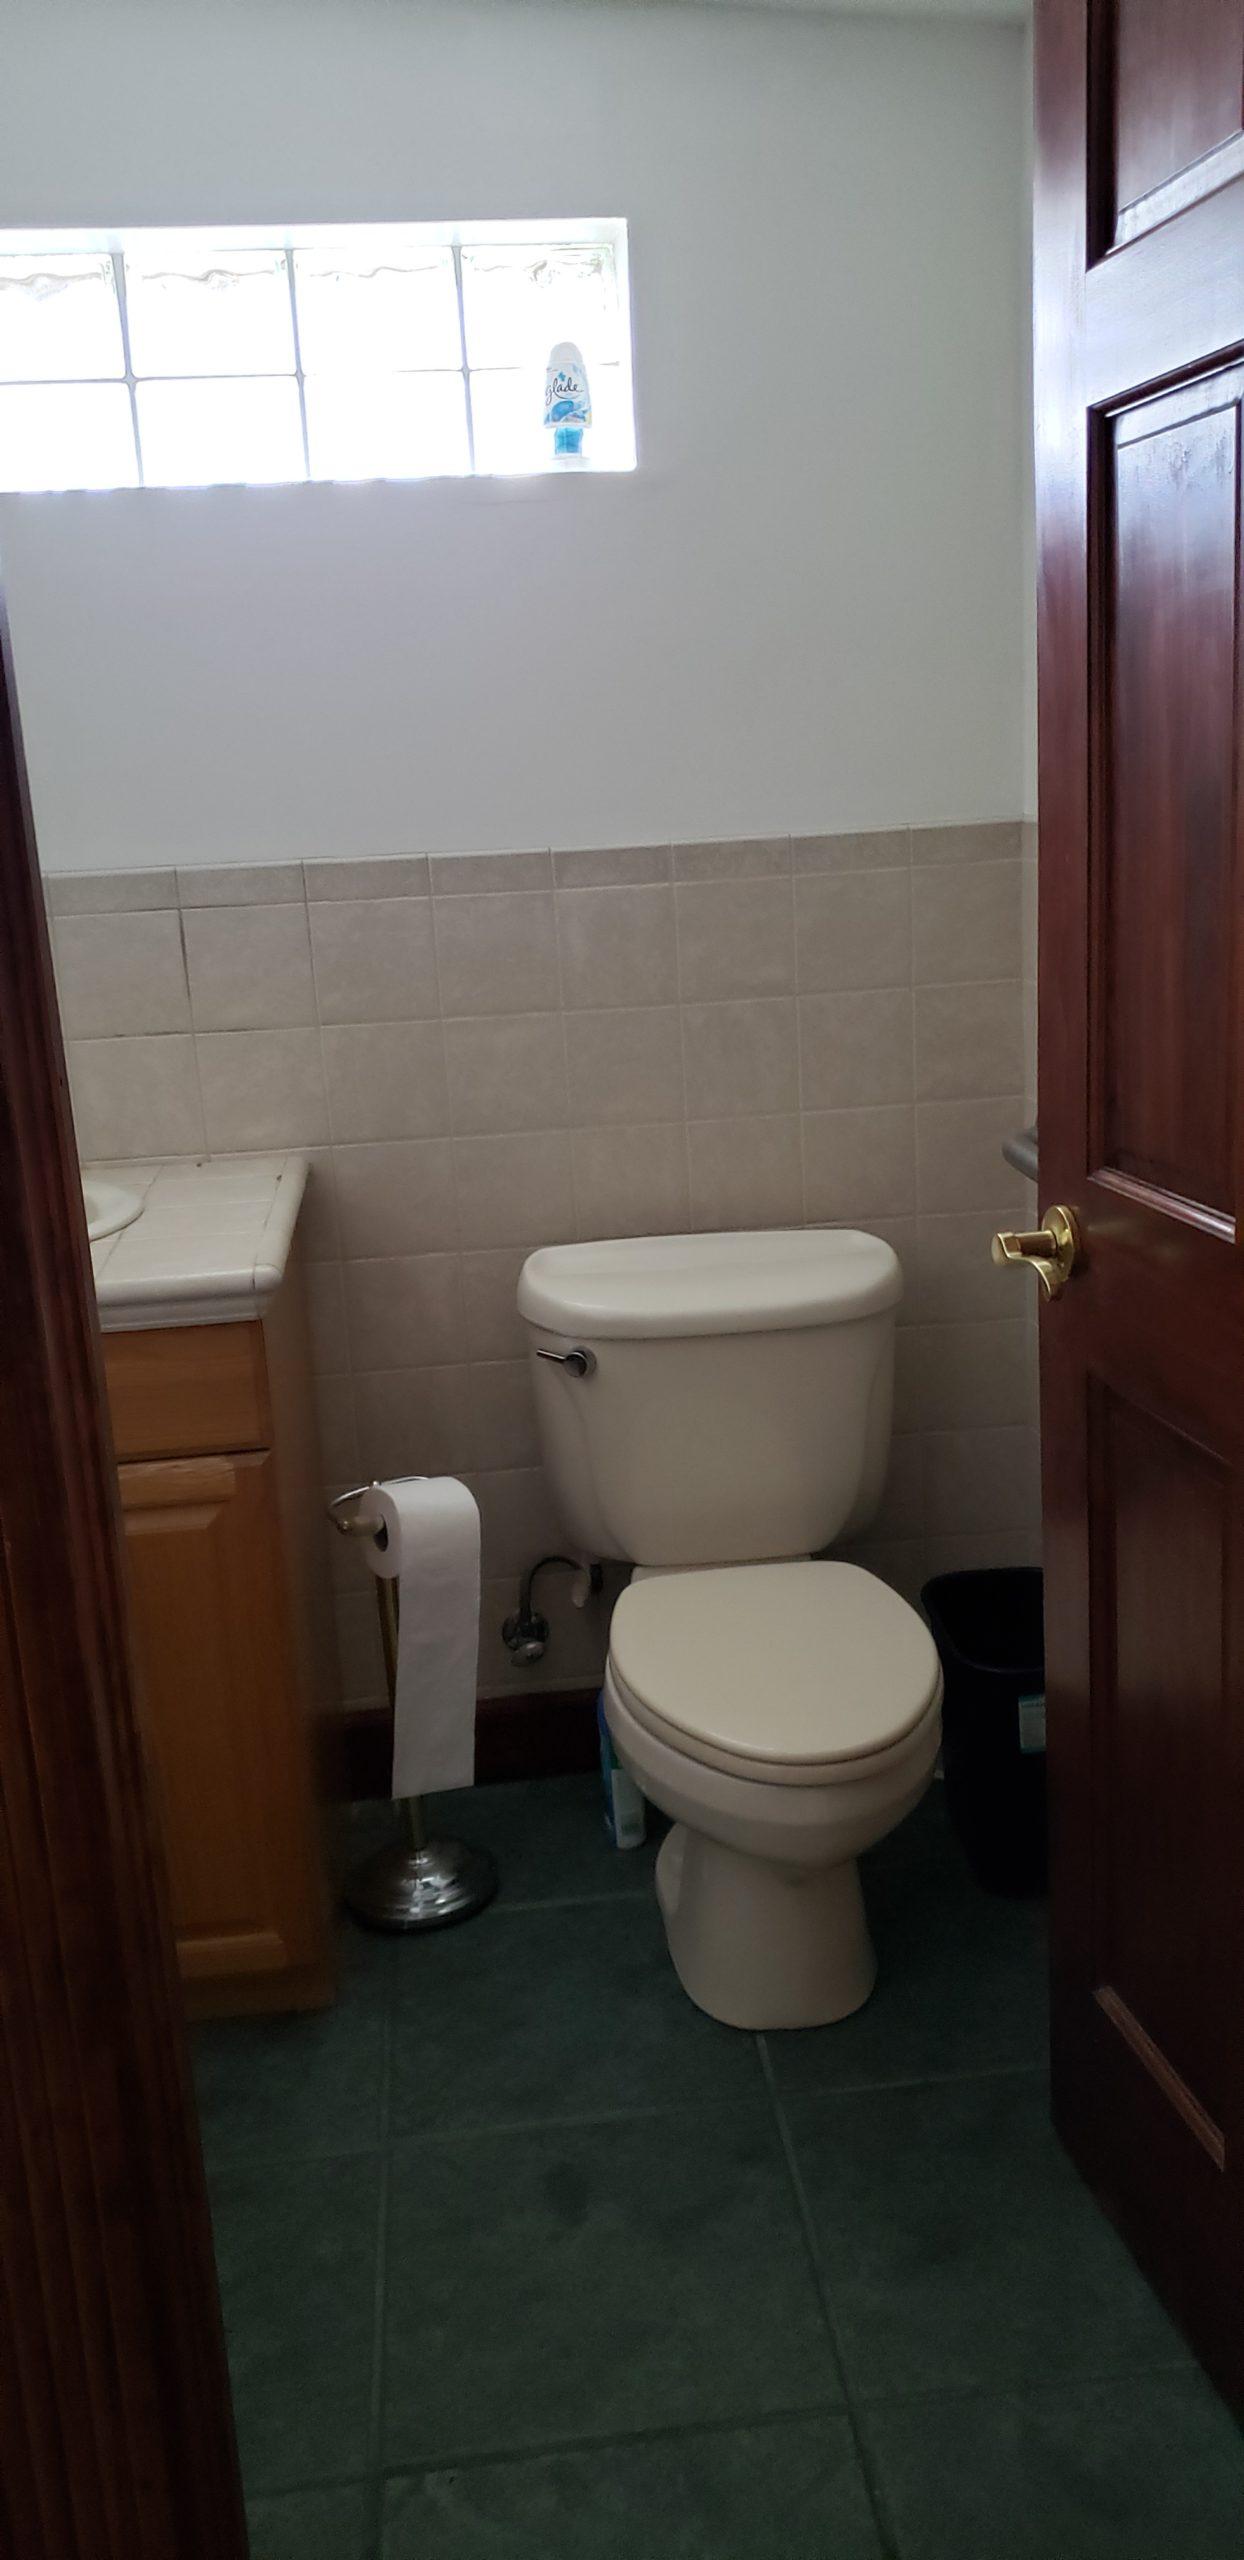 Restroom 2